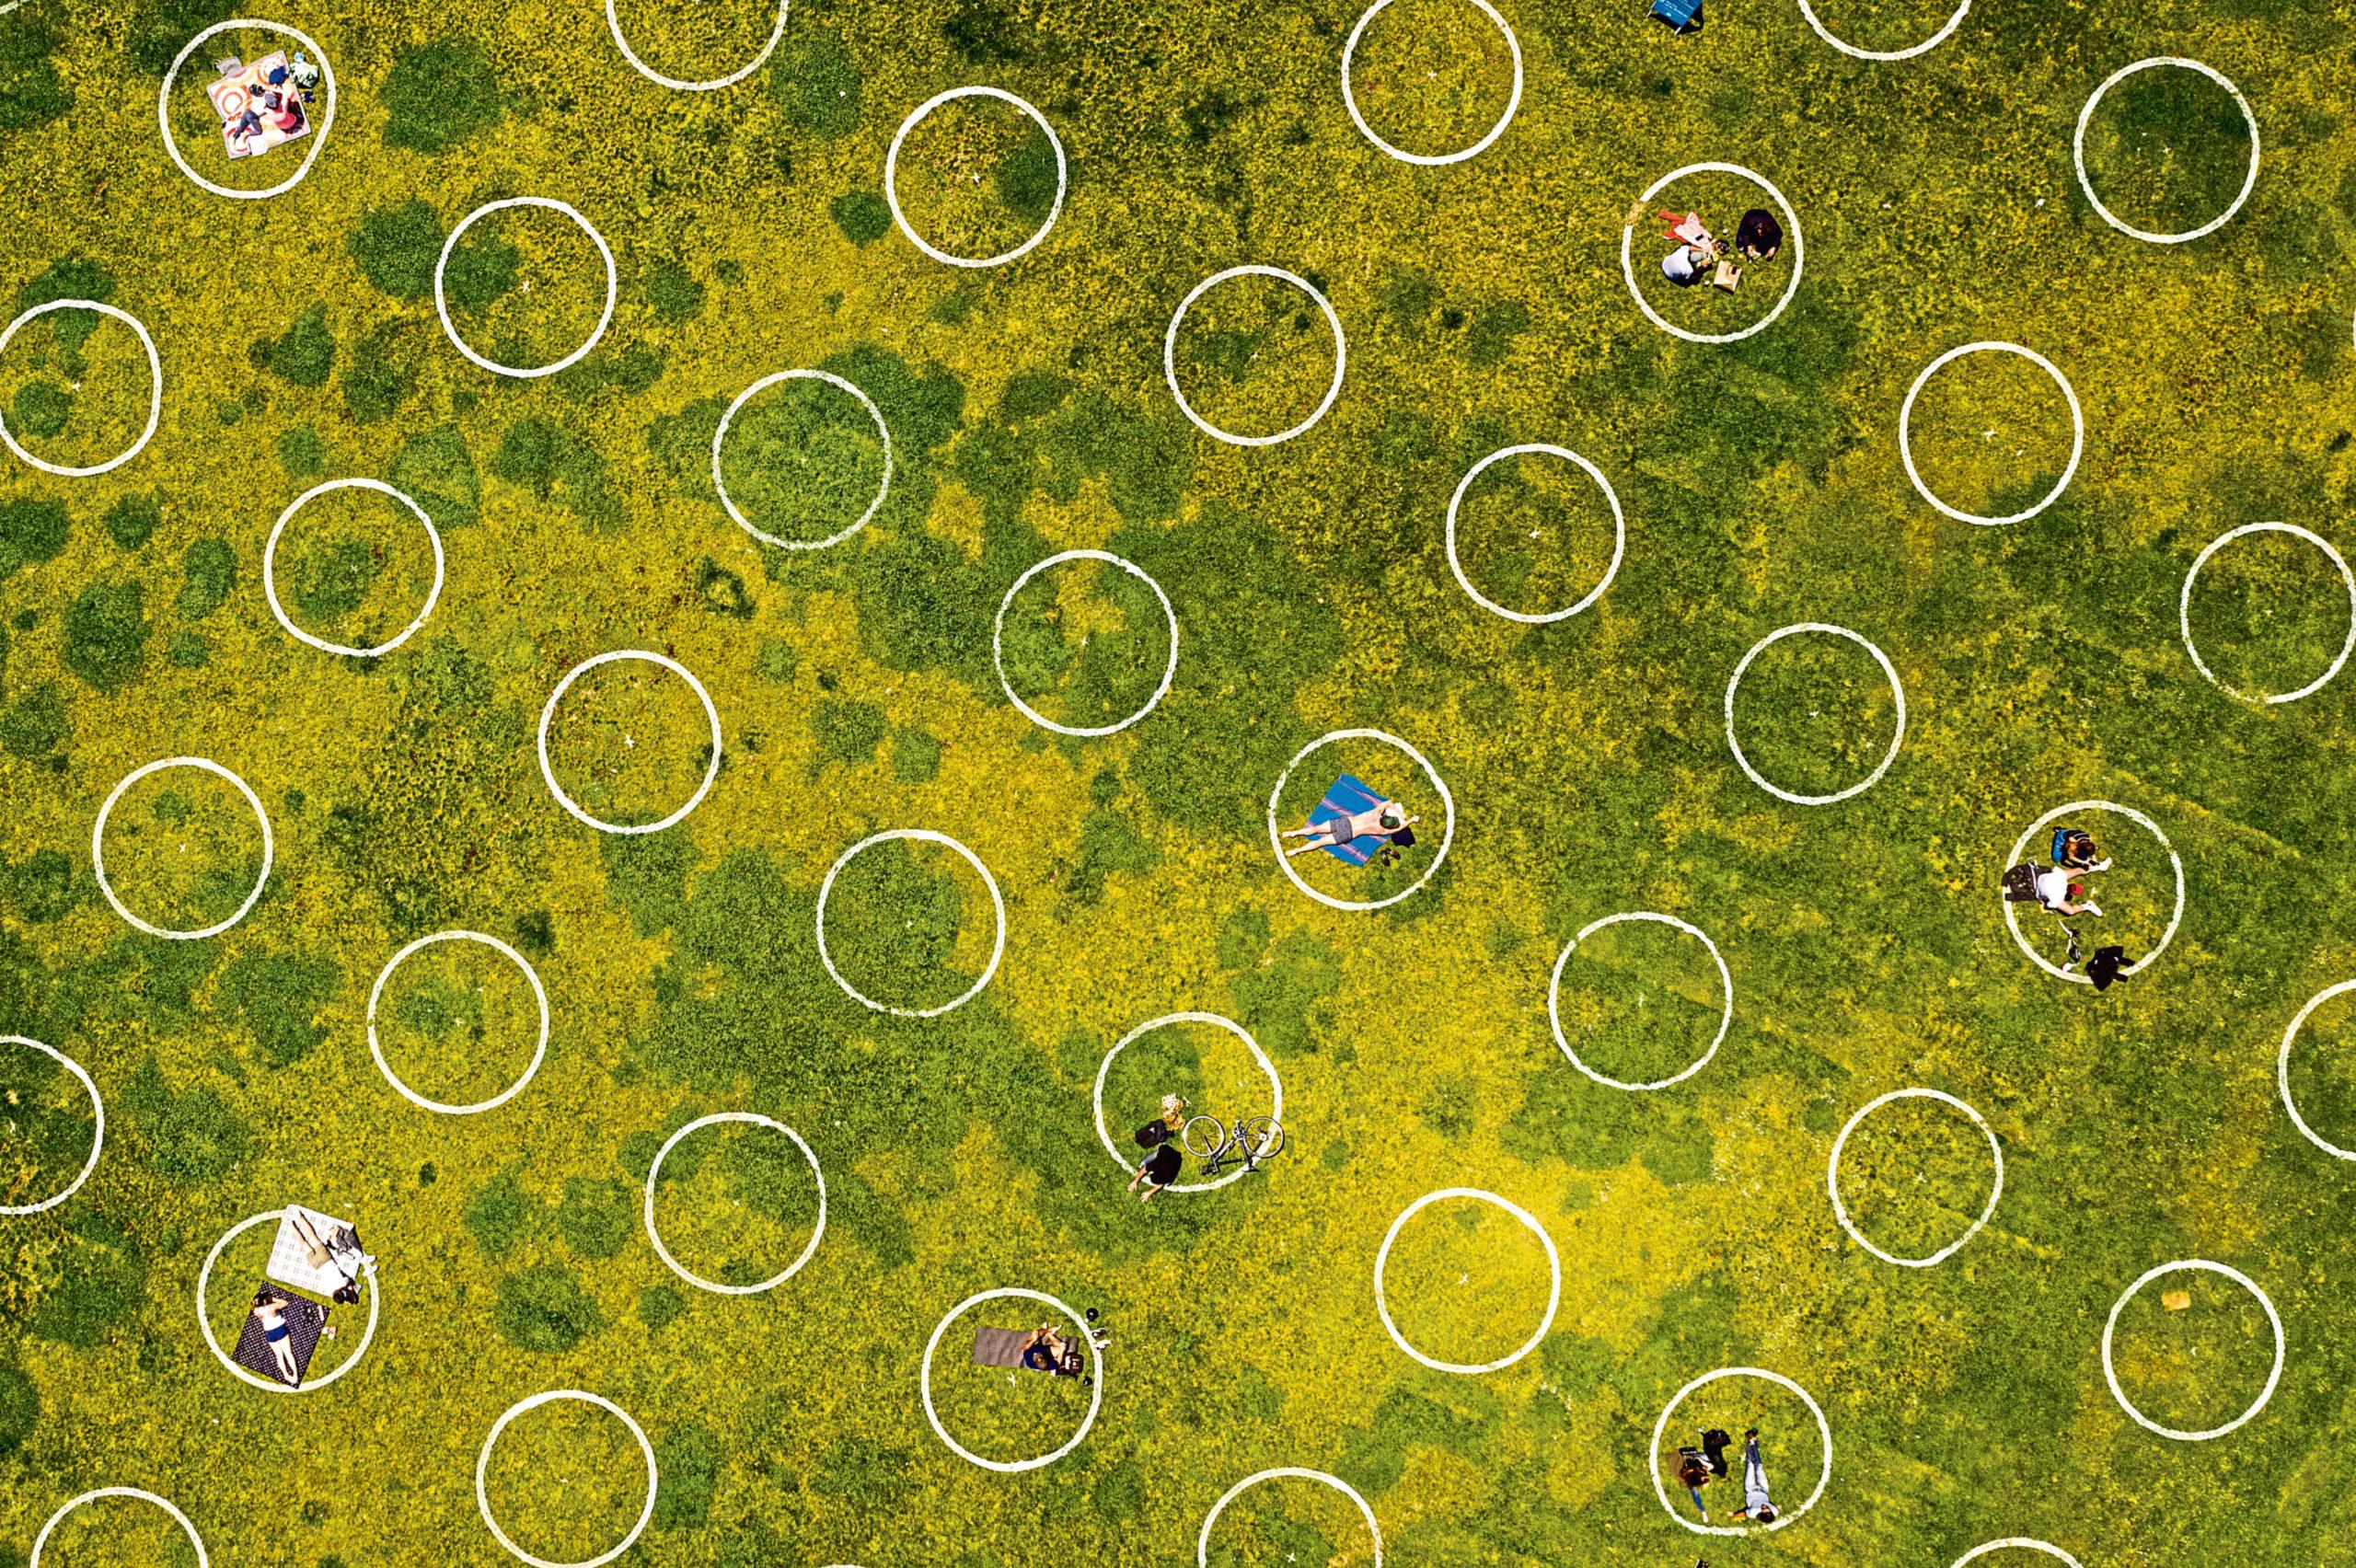 Social distancing circles marked in a San Francisco park.